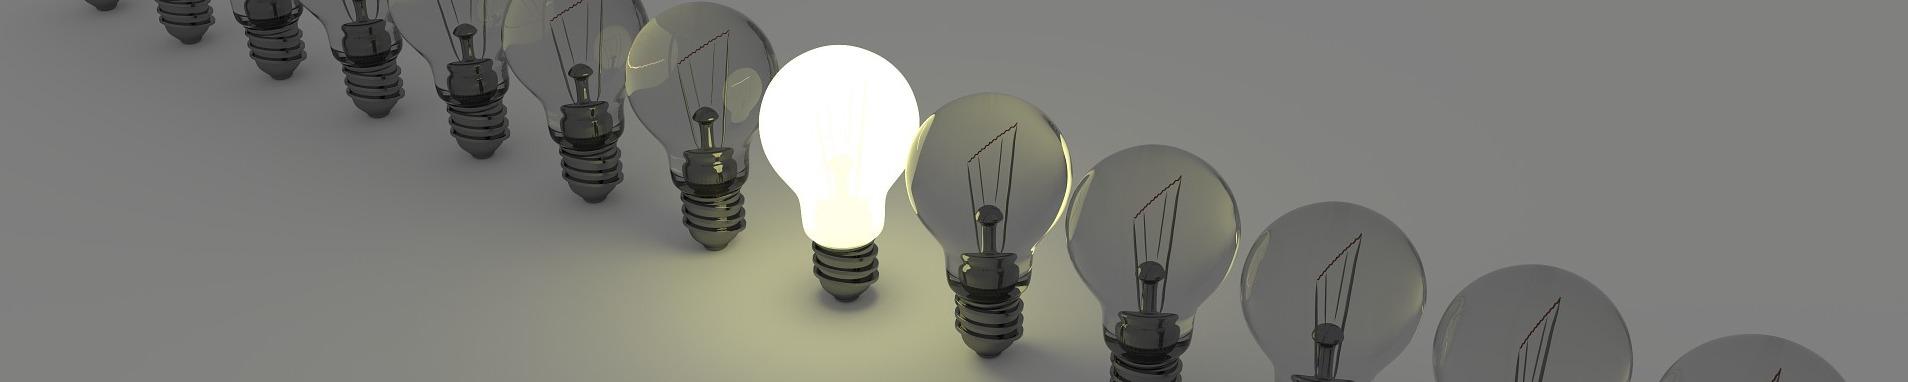 Licht Beleuchtung Eigenheim